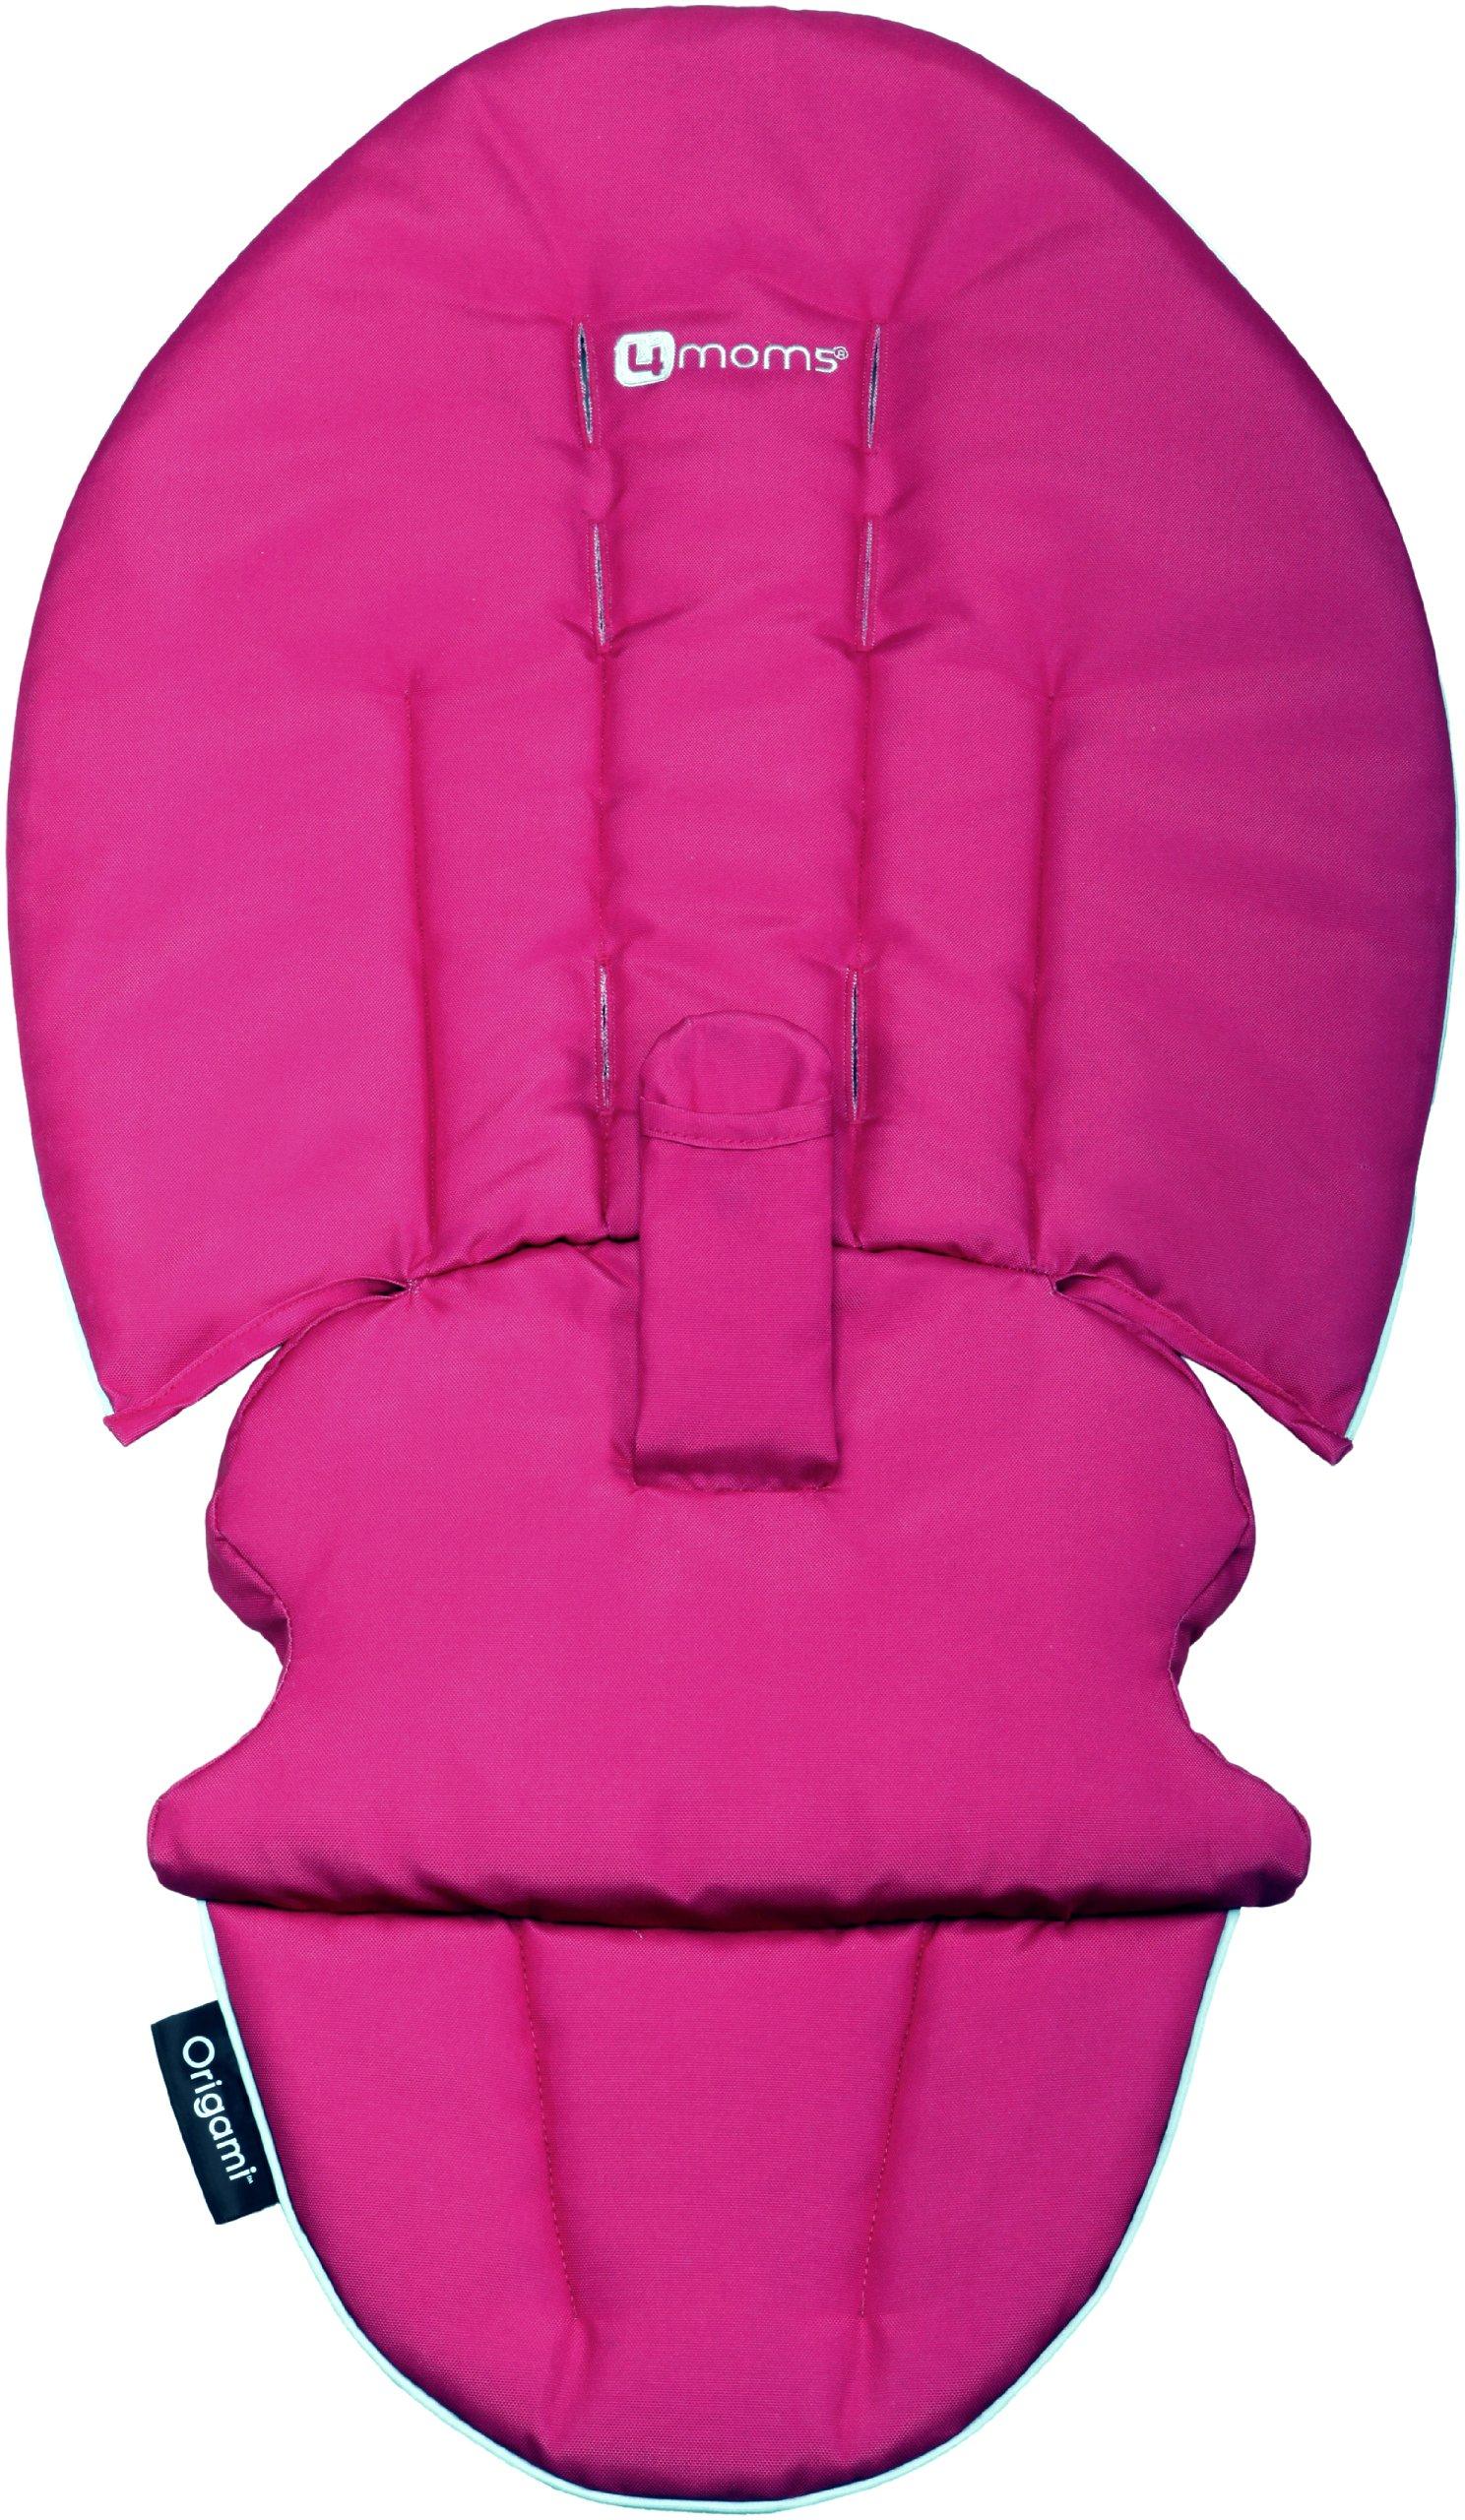 4moms Origami Color Kit, Pink